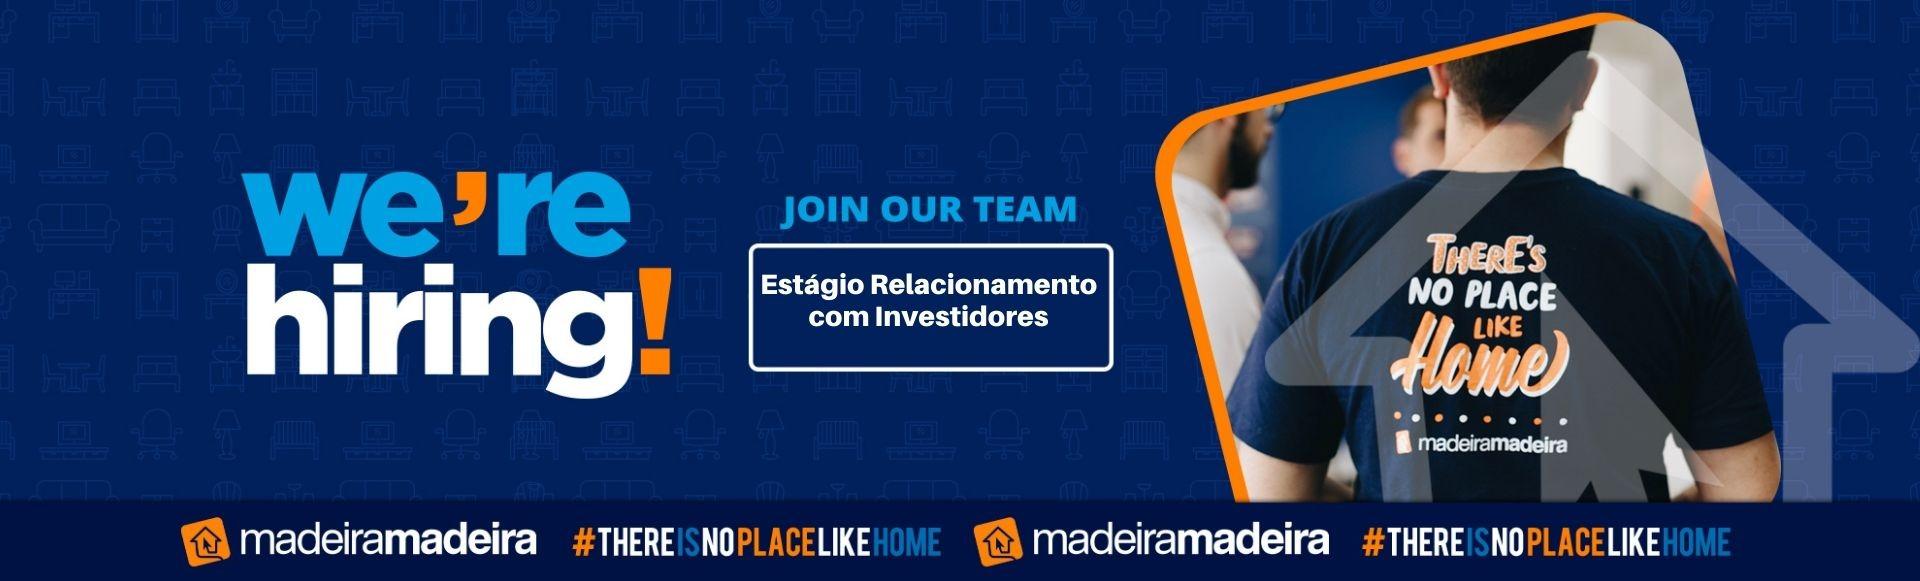 Estágio de Relacionamento com Investidores (Curitiba-PR)